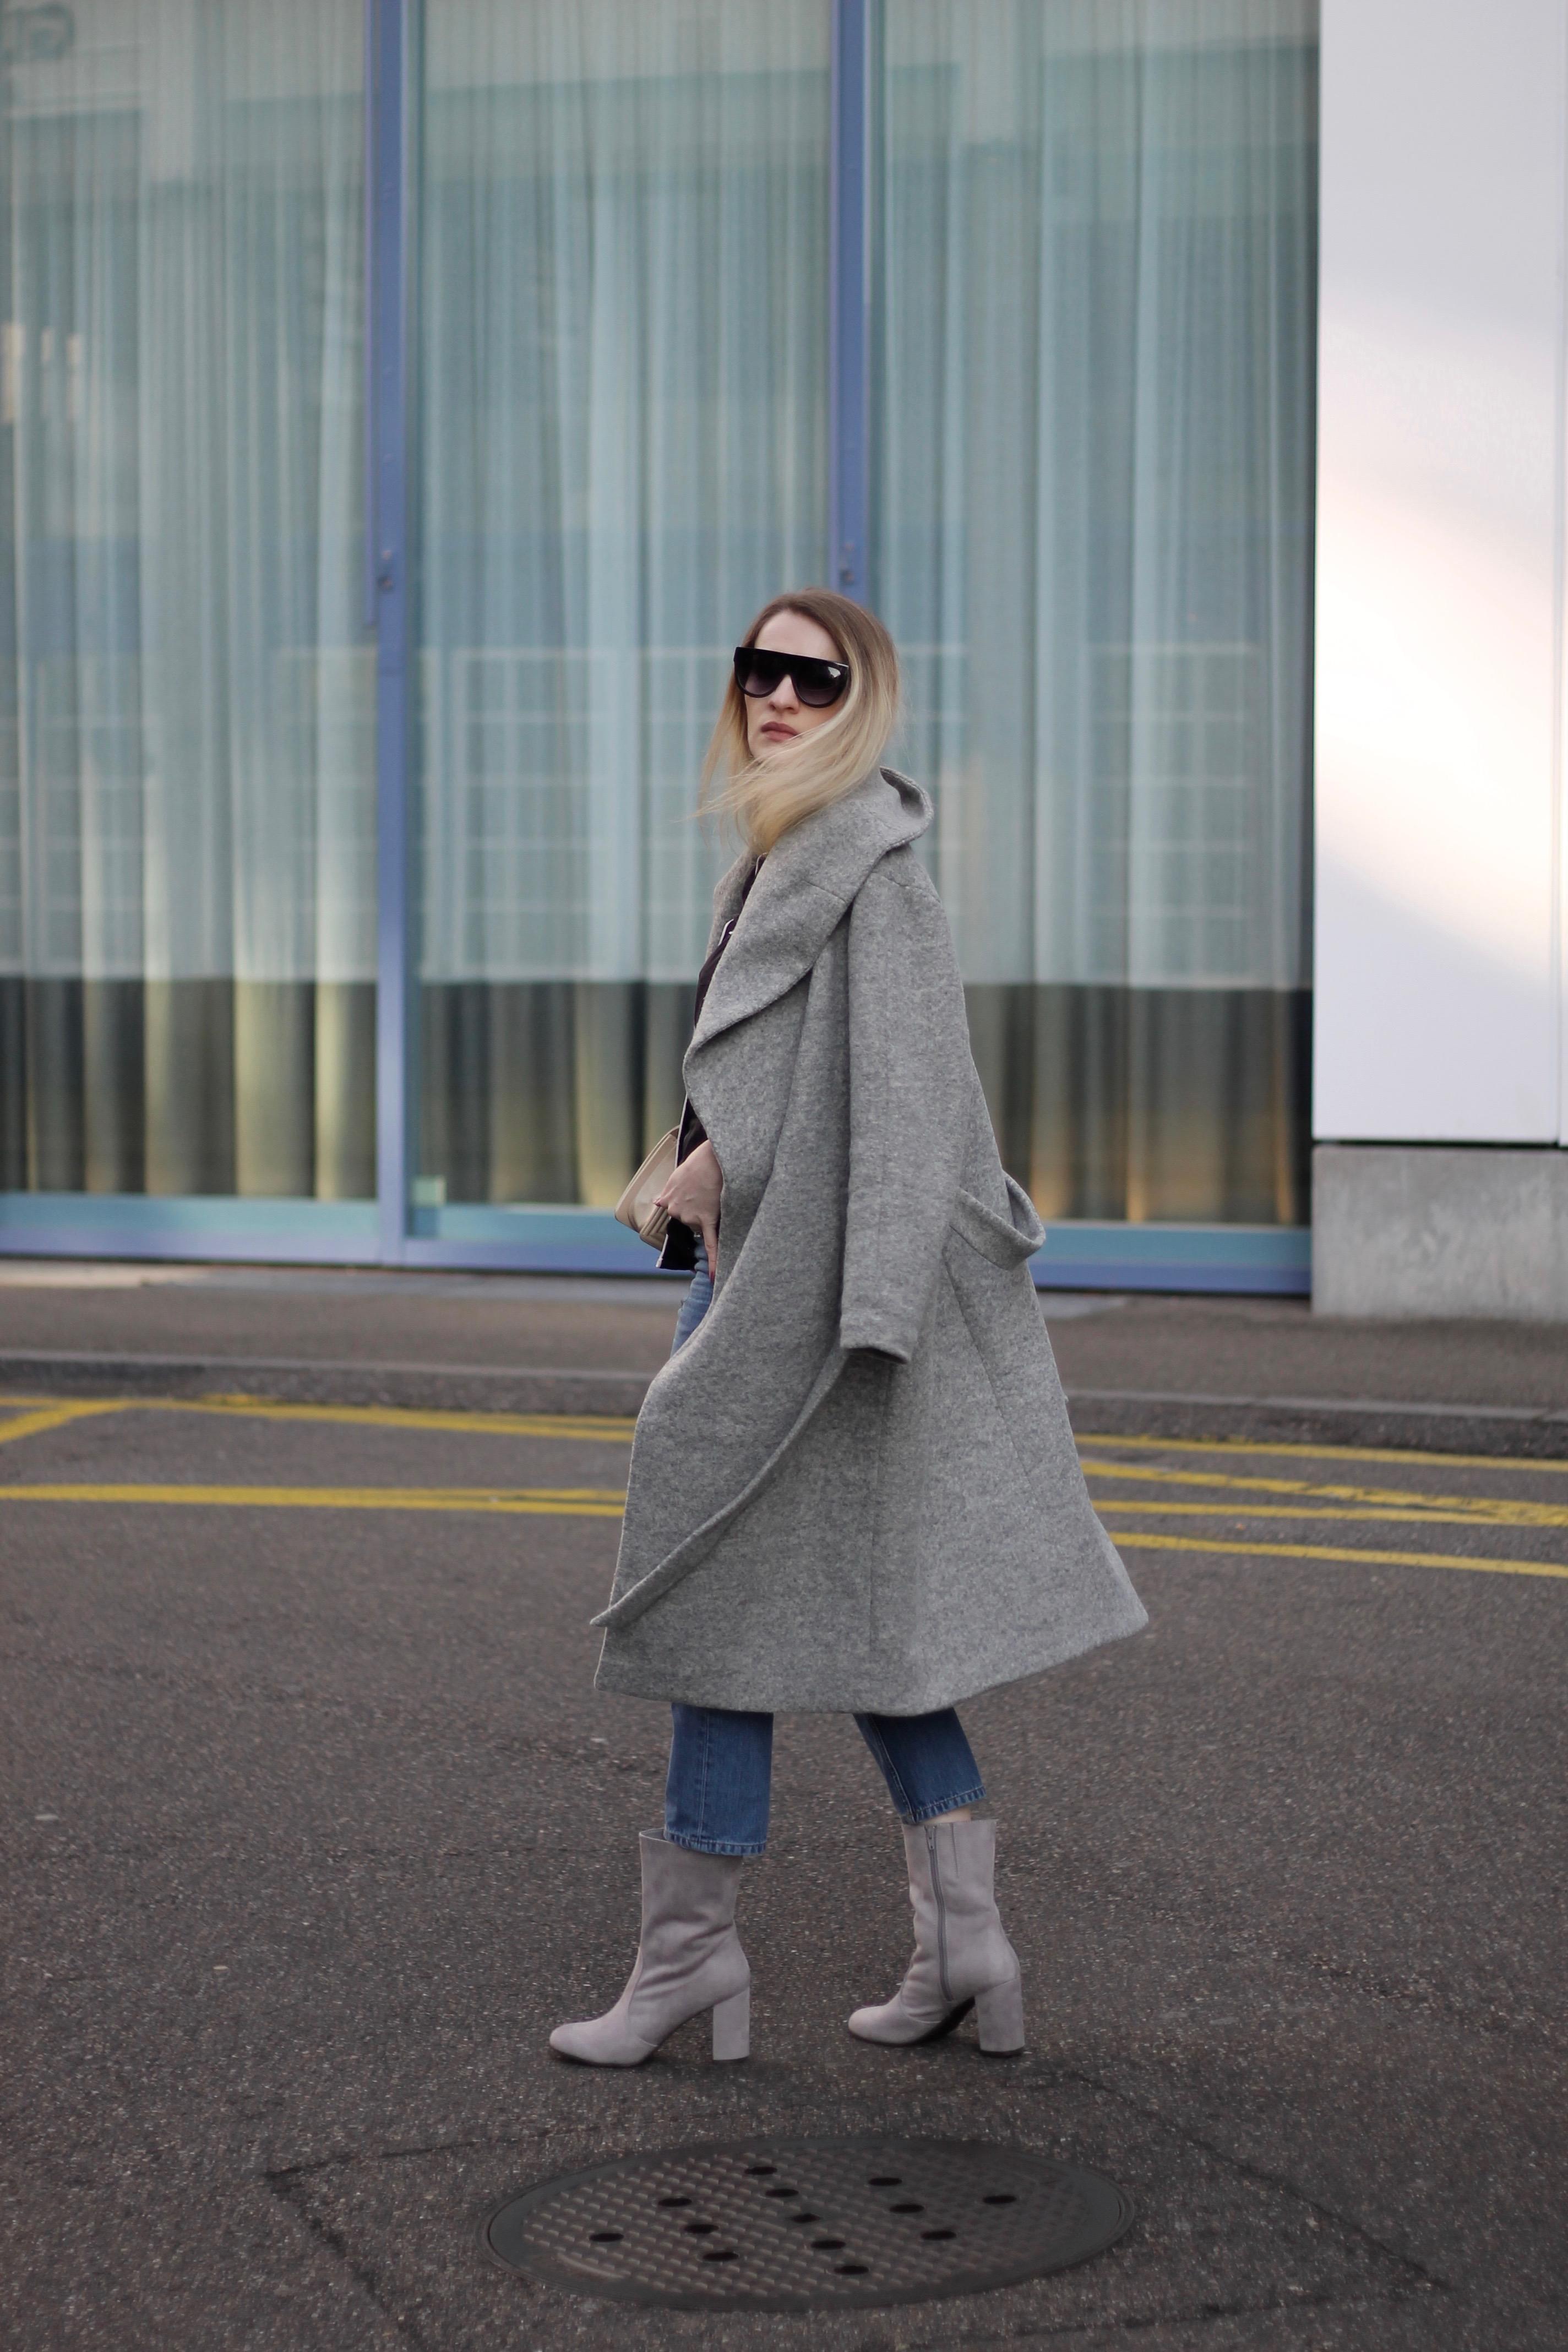 MON MODE   Fashion Blogger   Berlin Street Style   Fashion Trends   Berlin Fashion  Brussels  Chanel Boy  PJ Bed Sheets